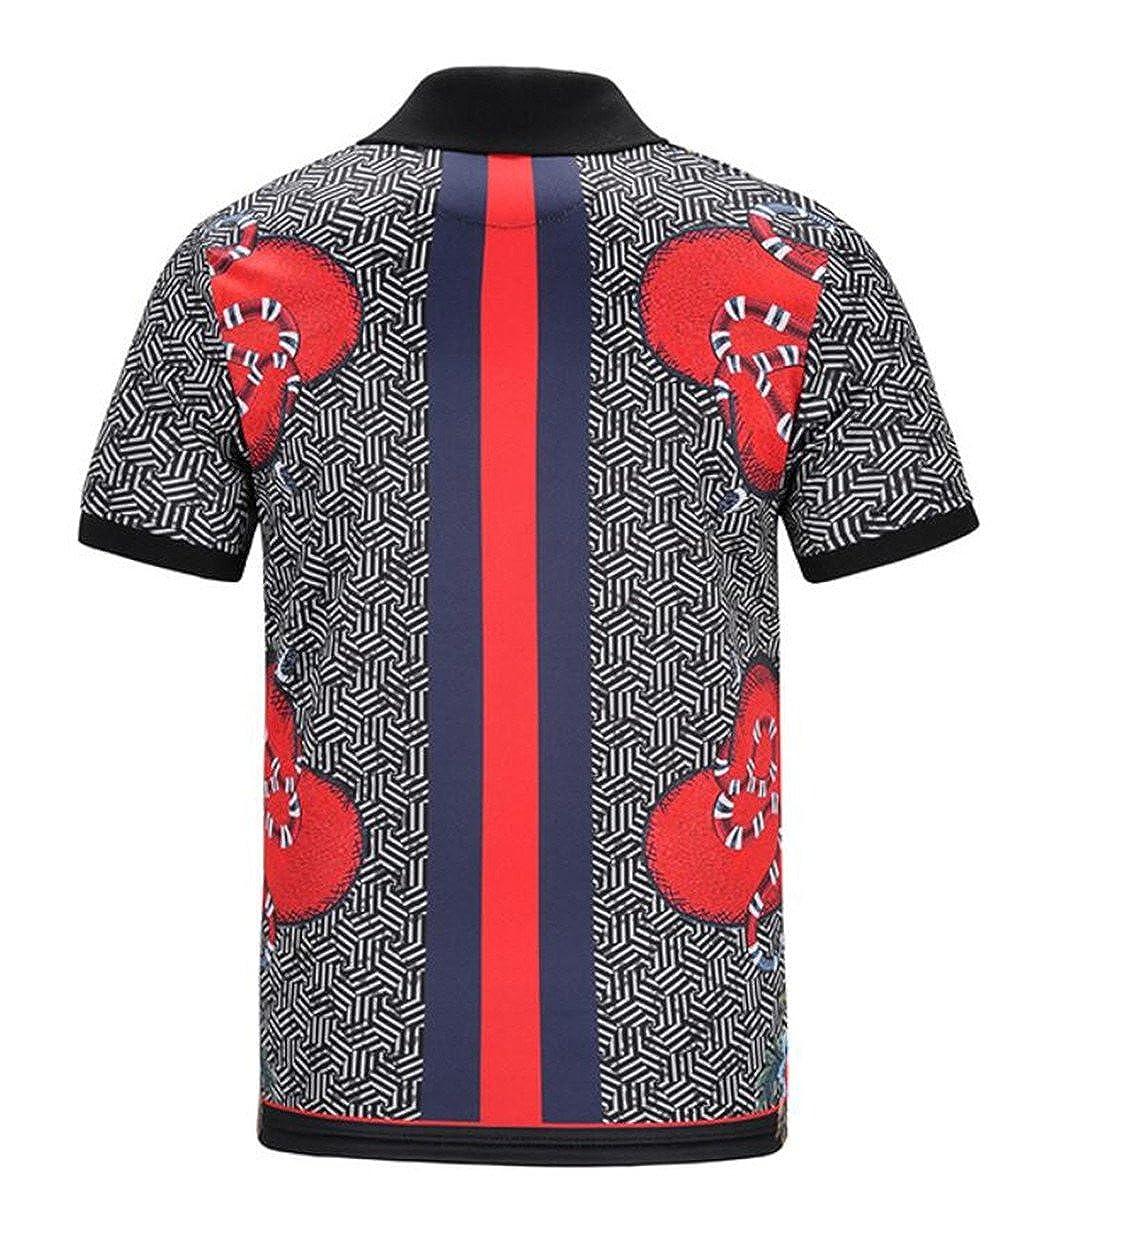 yibiyuan Mens 3D Printed Turn Down Collar Vintage Casual Short Sleeve Polo Shirts